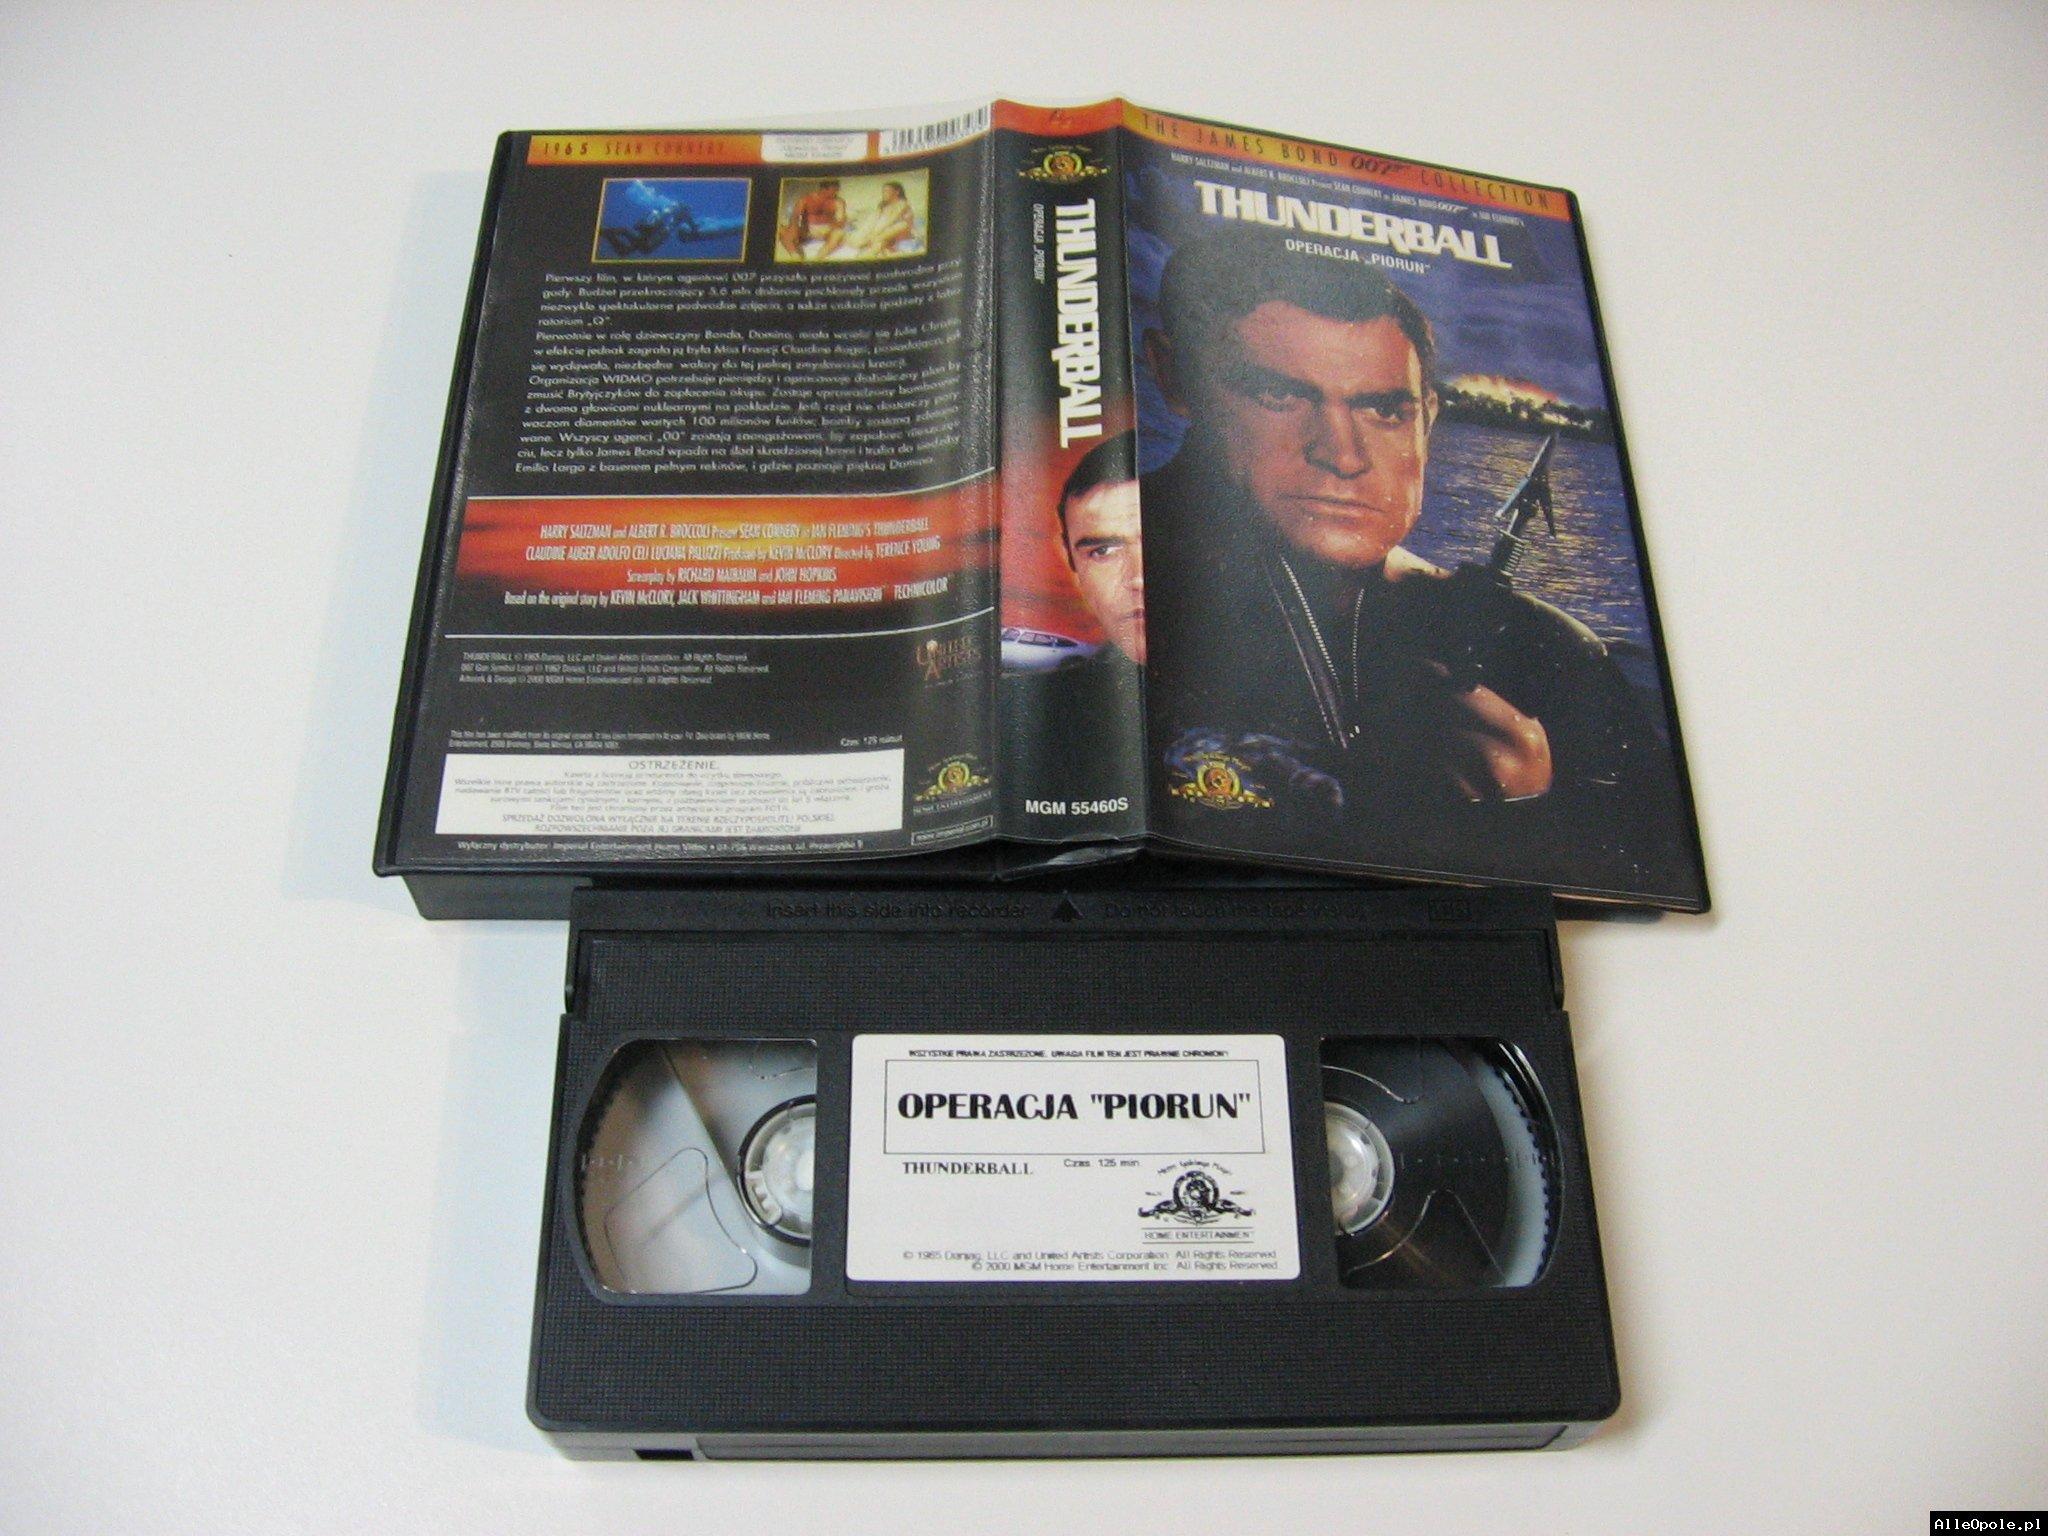 007 OPERACJA PIORUN - VHS Kaseta Video - Opole 1738